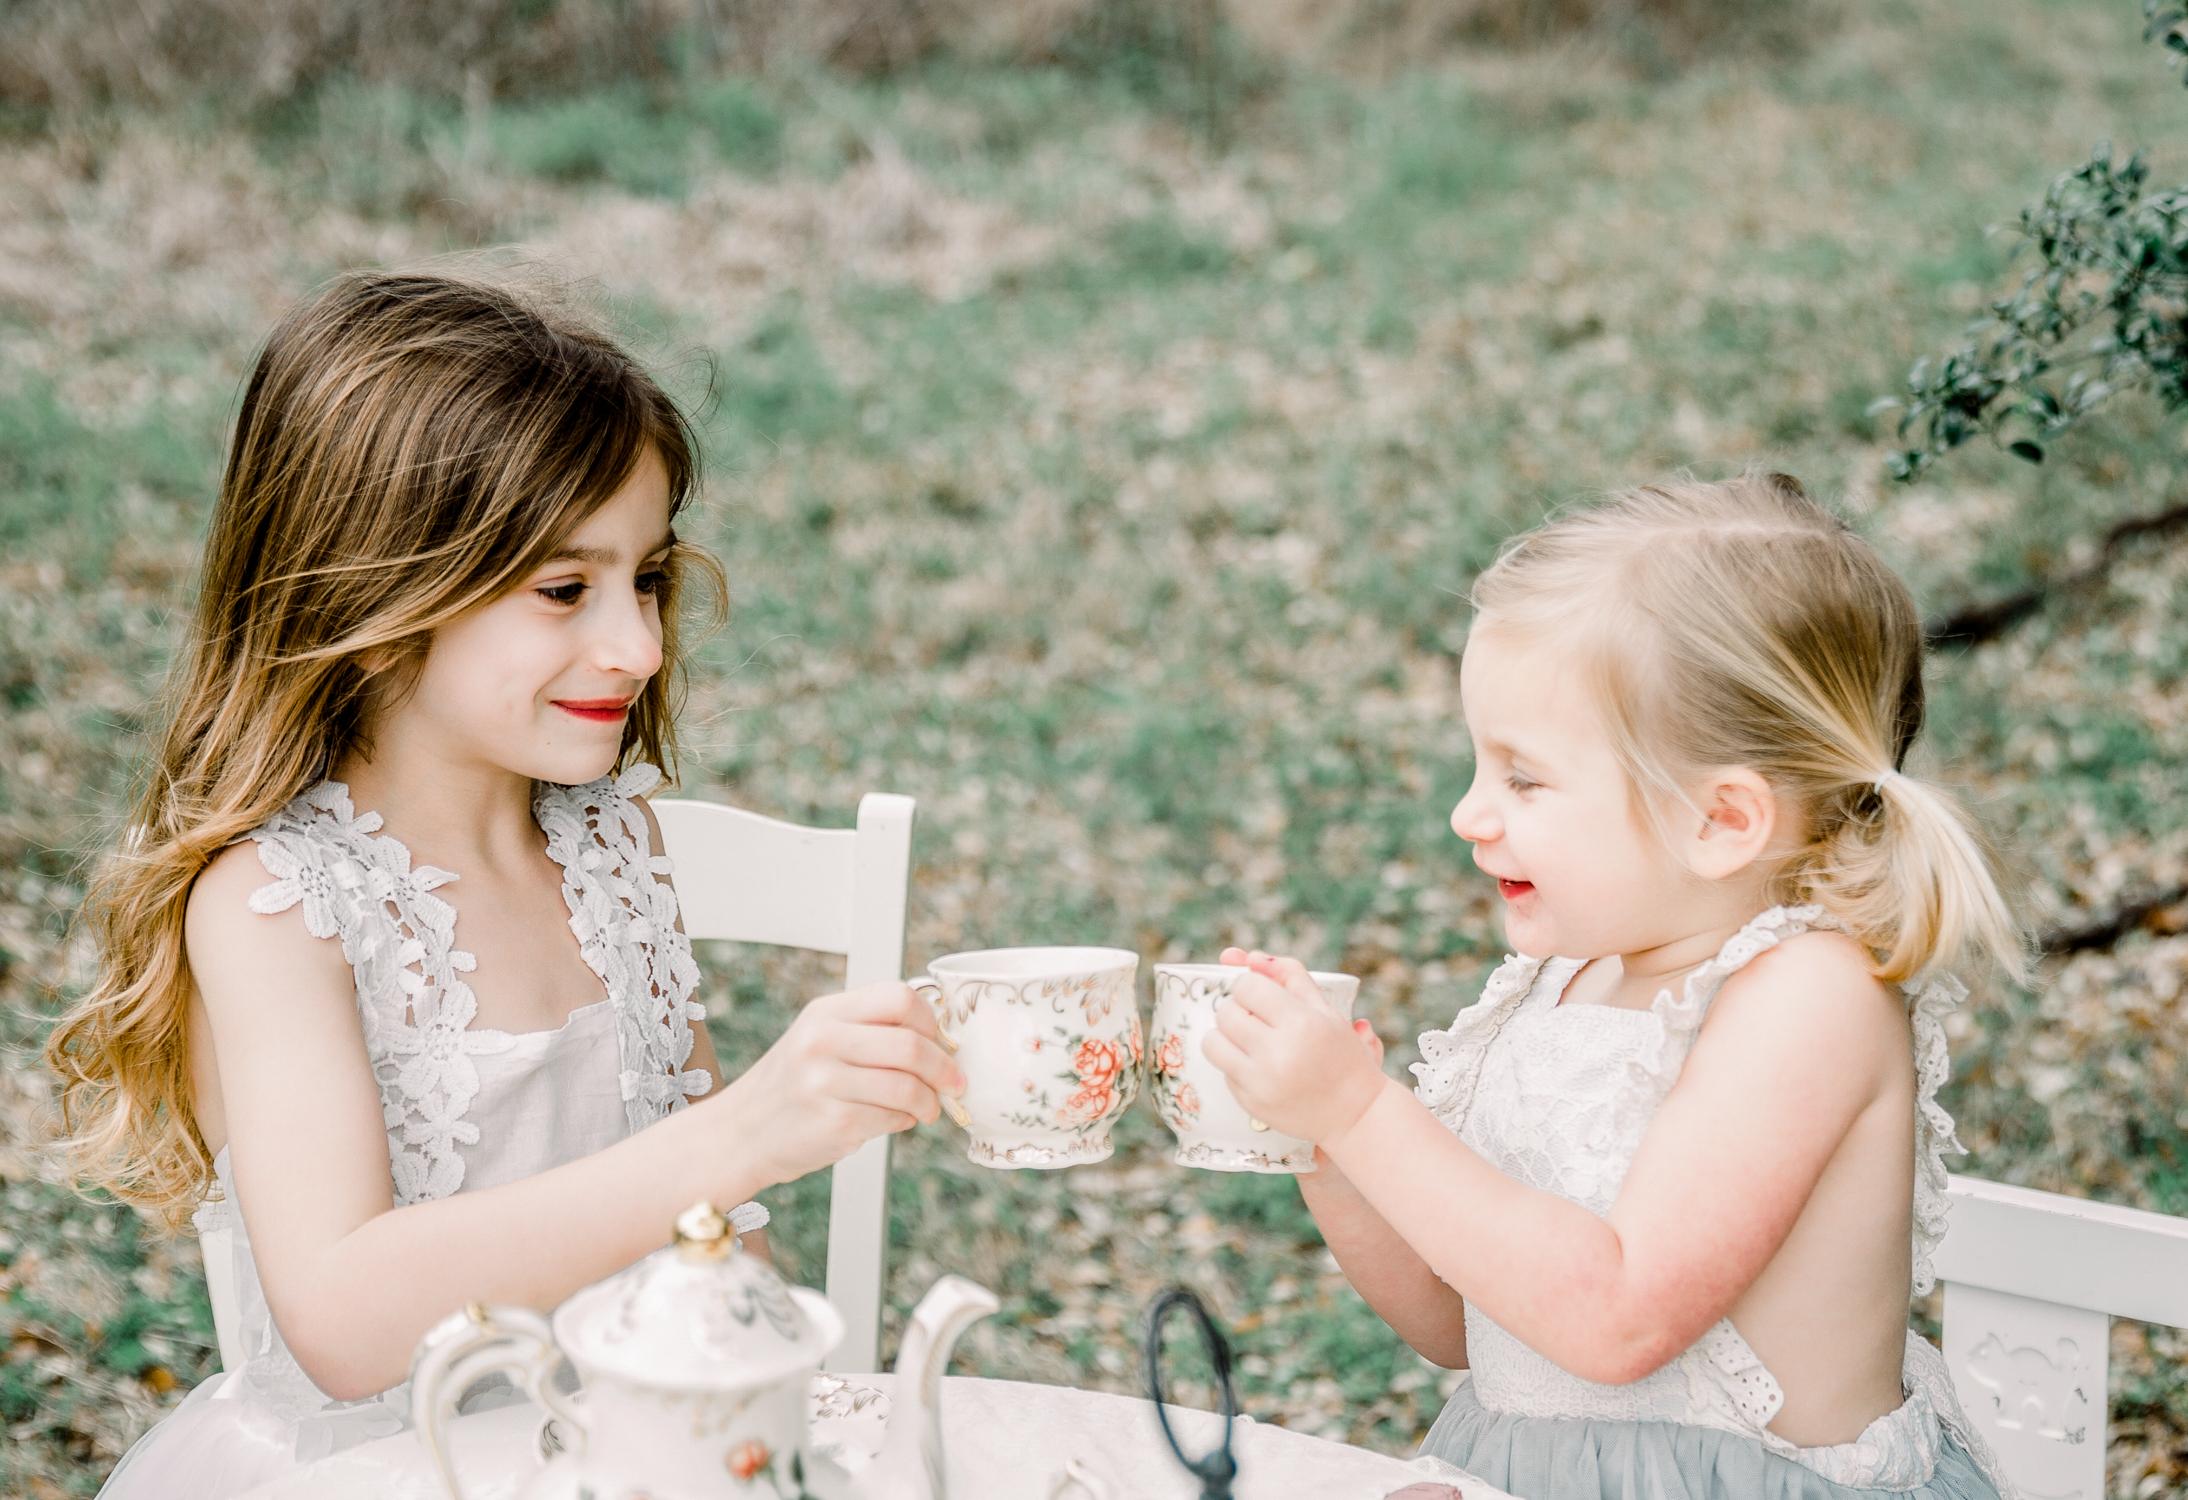 lifestyle-family-photographer-franklin-tea-time-8.jpg